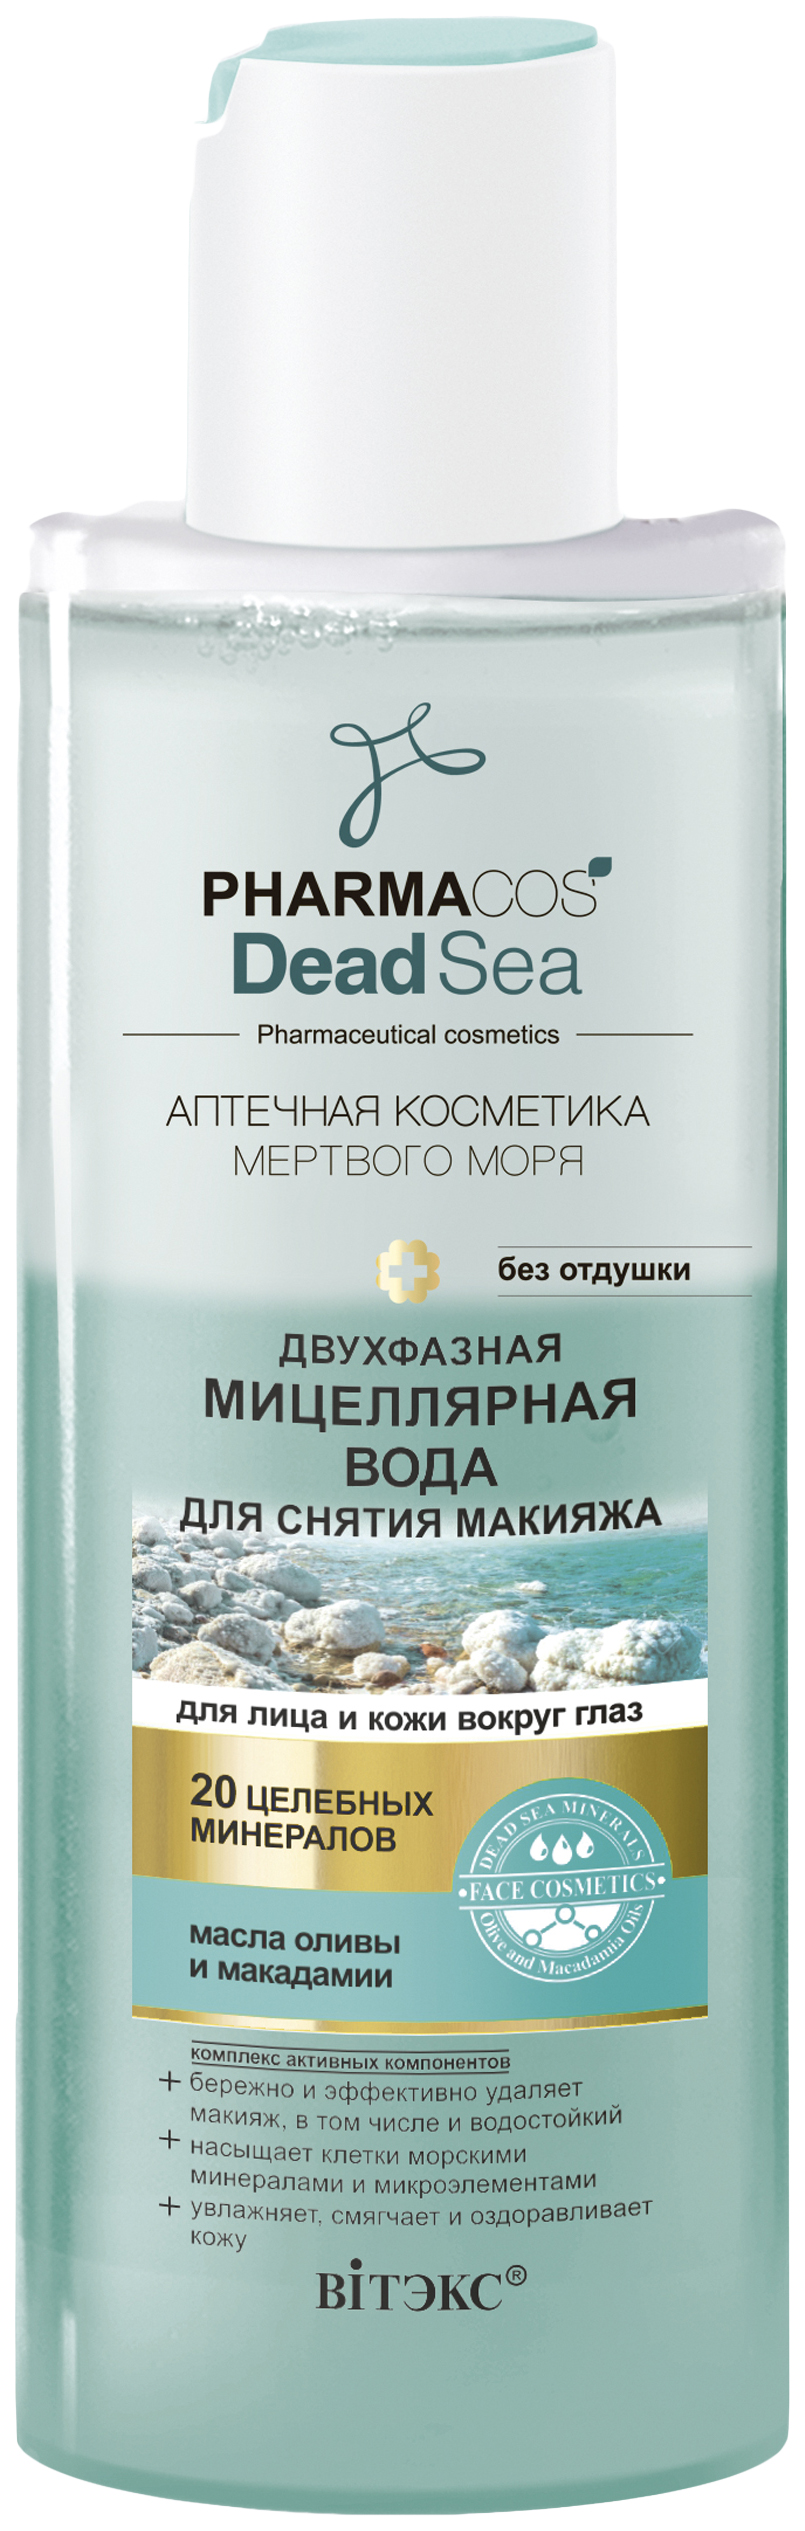 Мицеллярная вода Витэкс Pharmacos Dead Sea